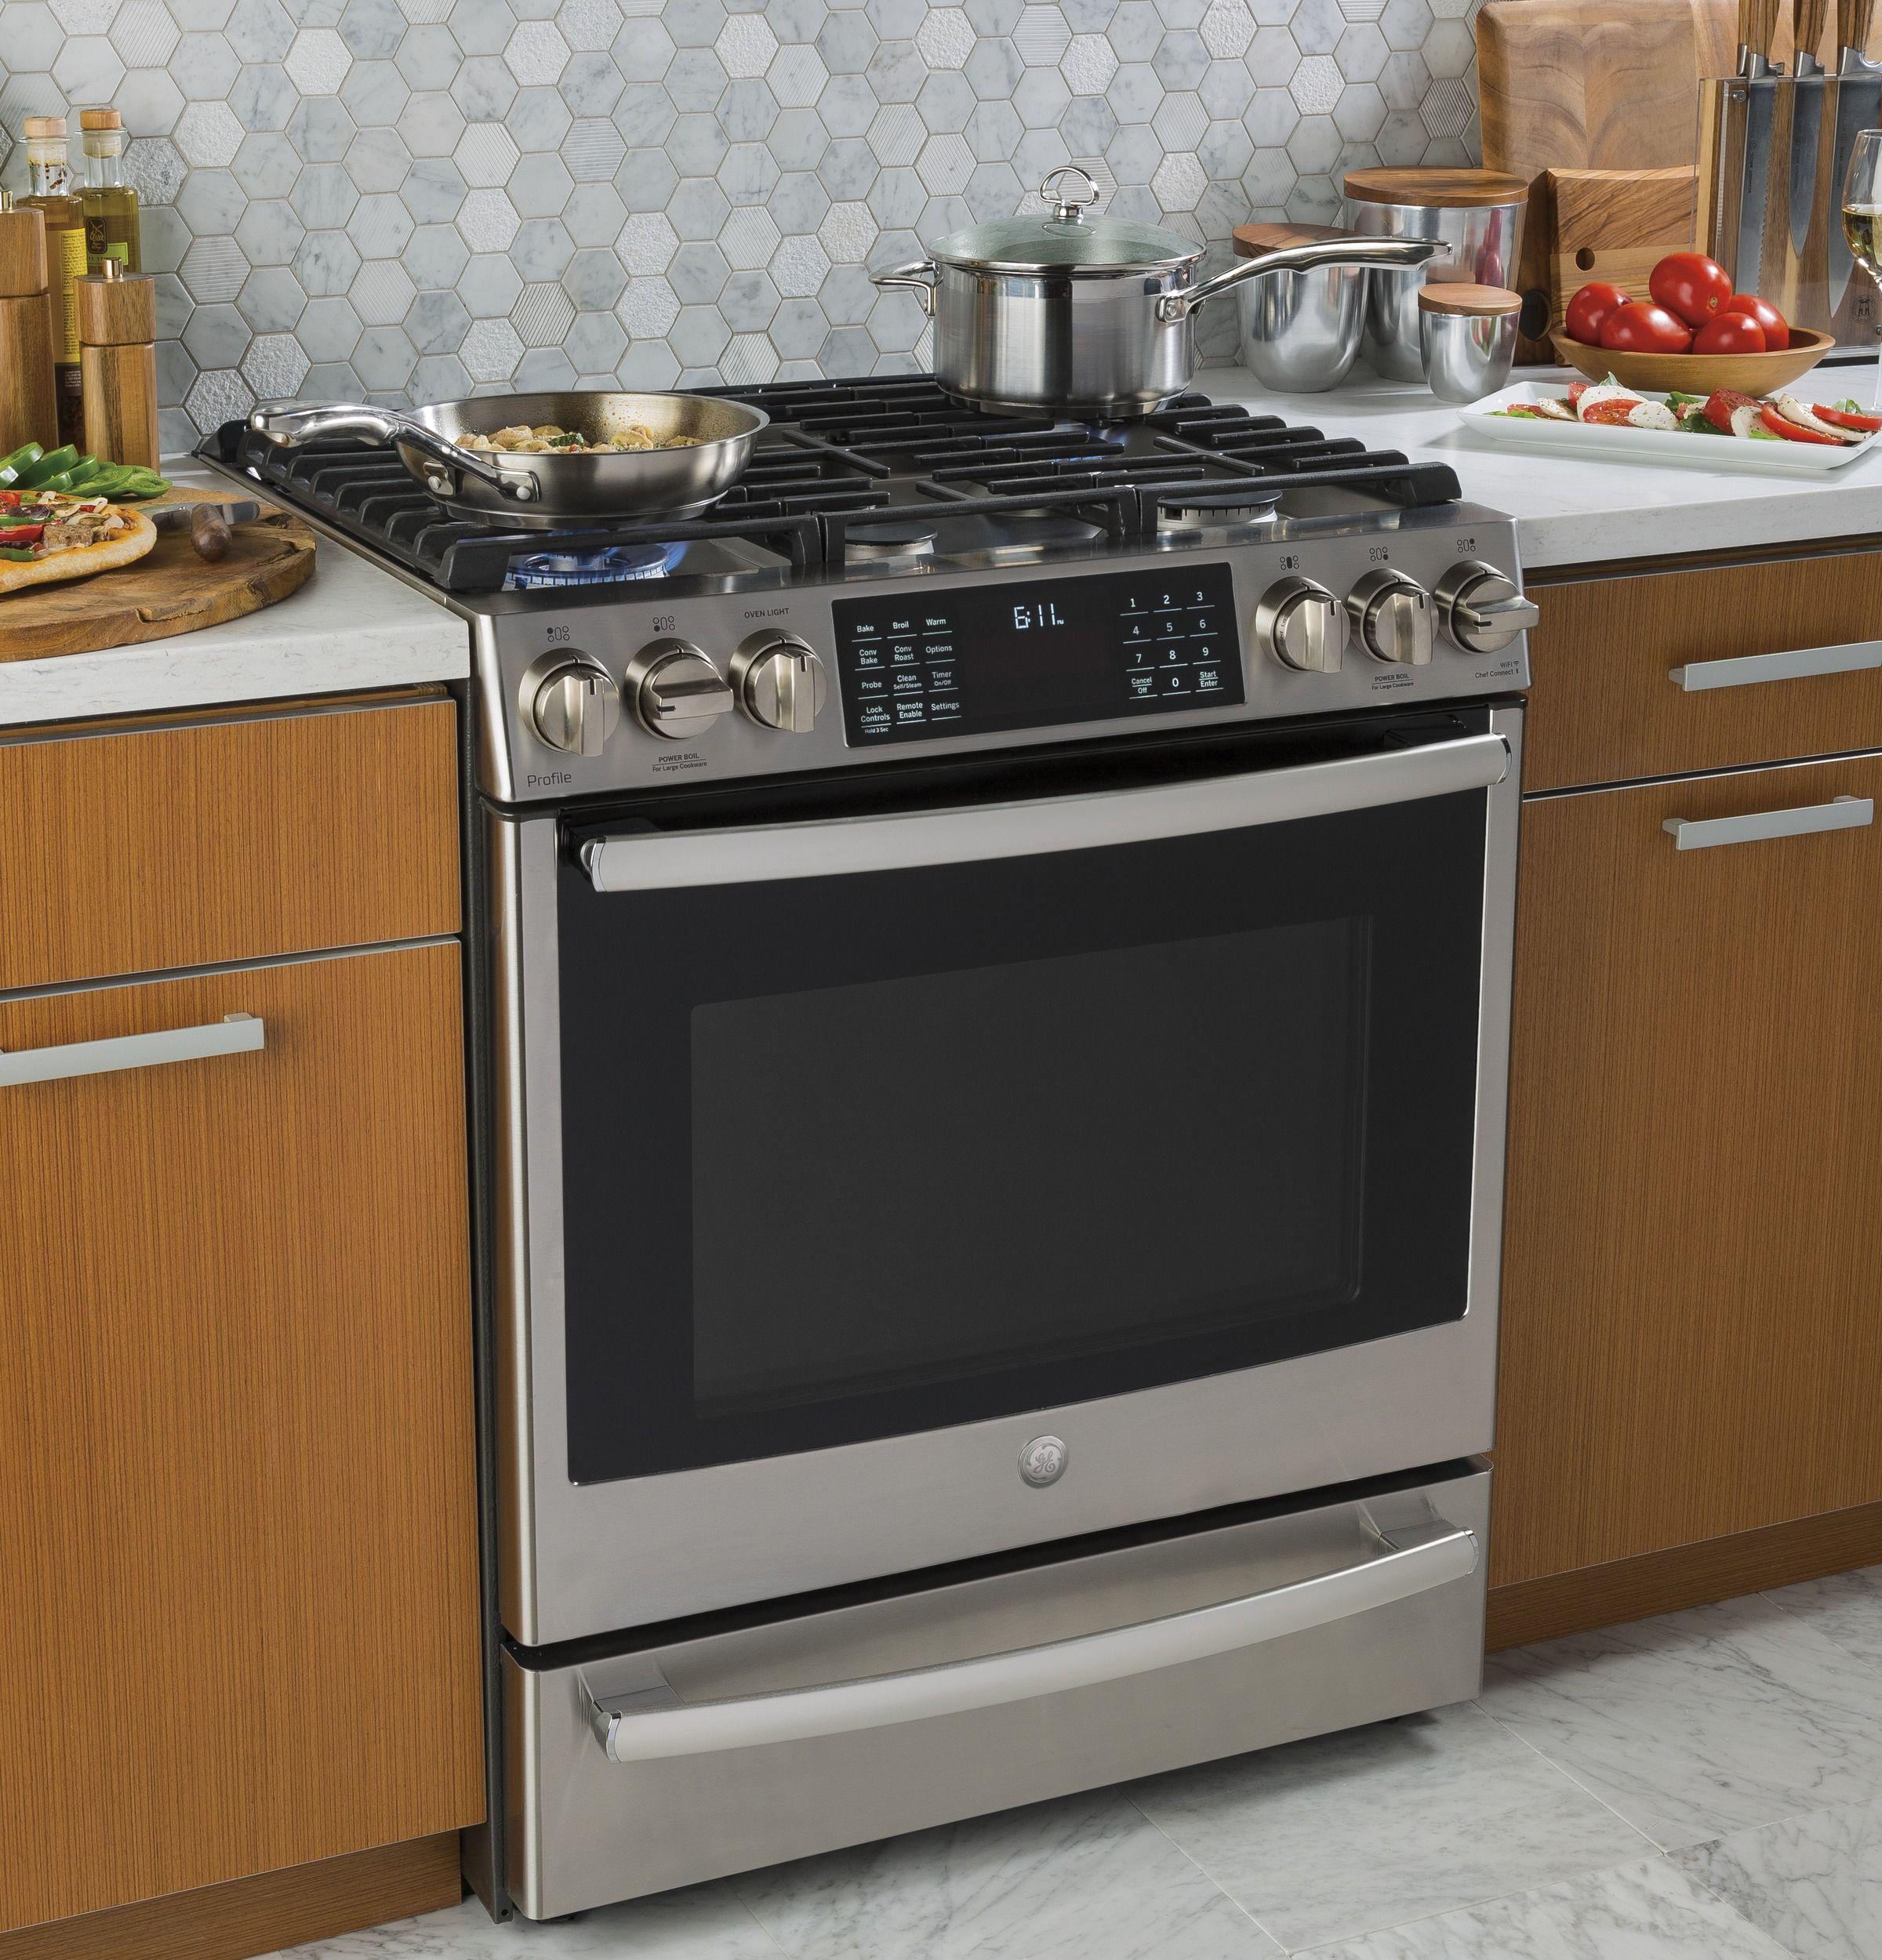 Ge Profile 30 Smart Dual Fuel Slide In Front Control Range P2s930selss Kitchen Renovation New Kitchen Kitchen Remodel